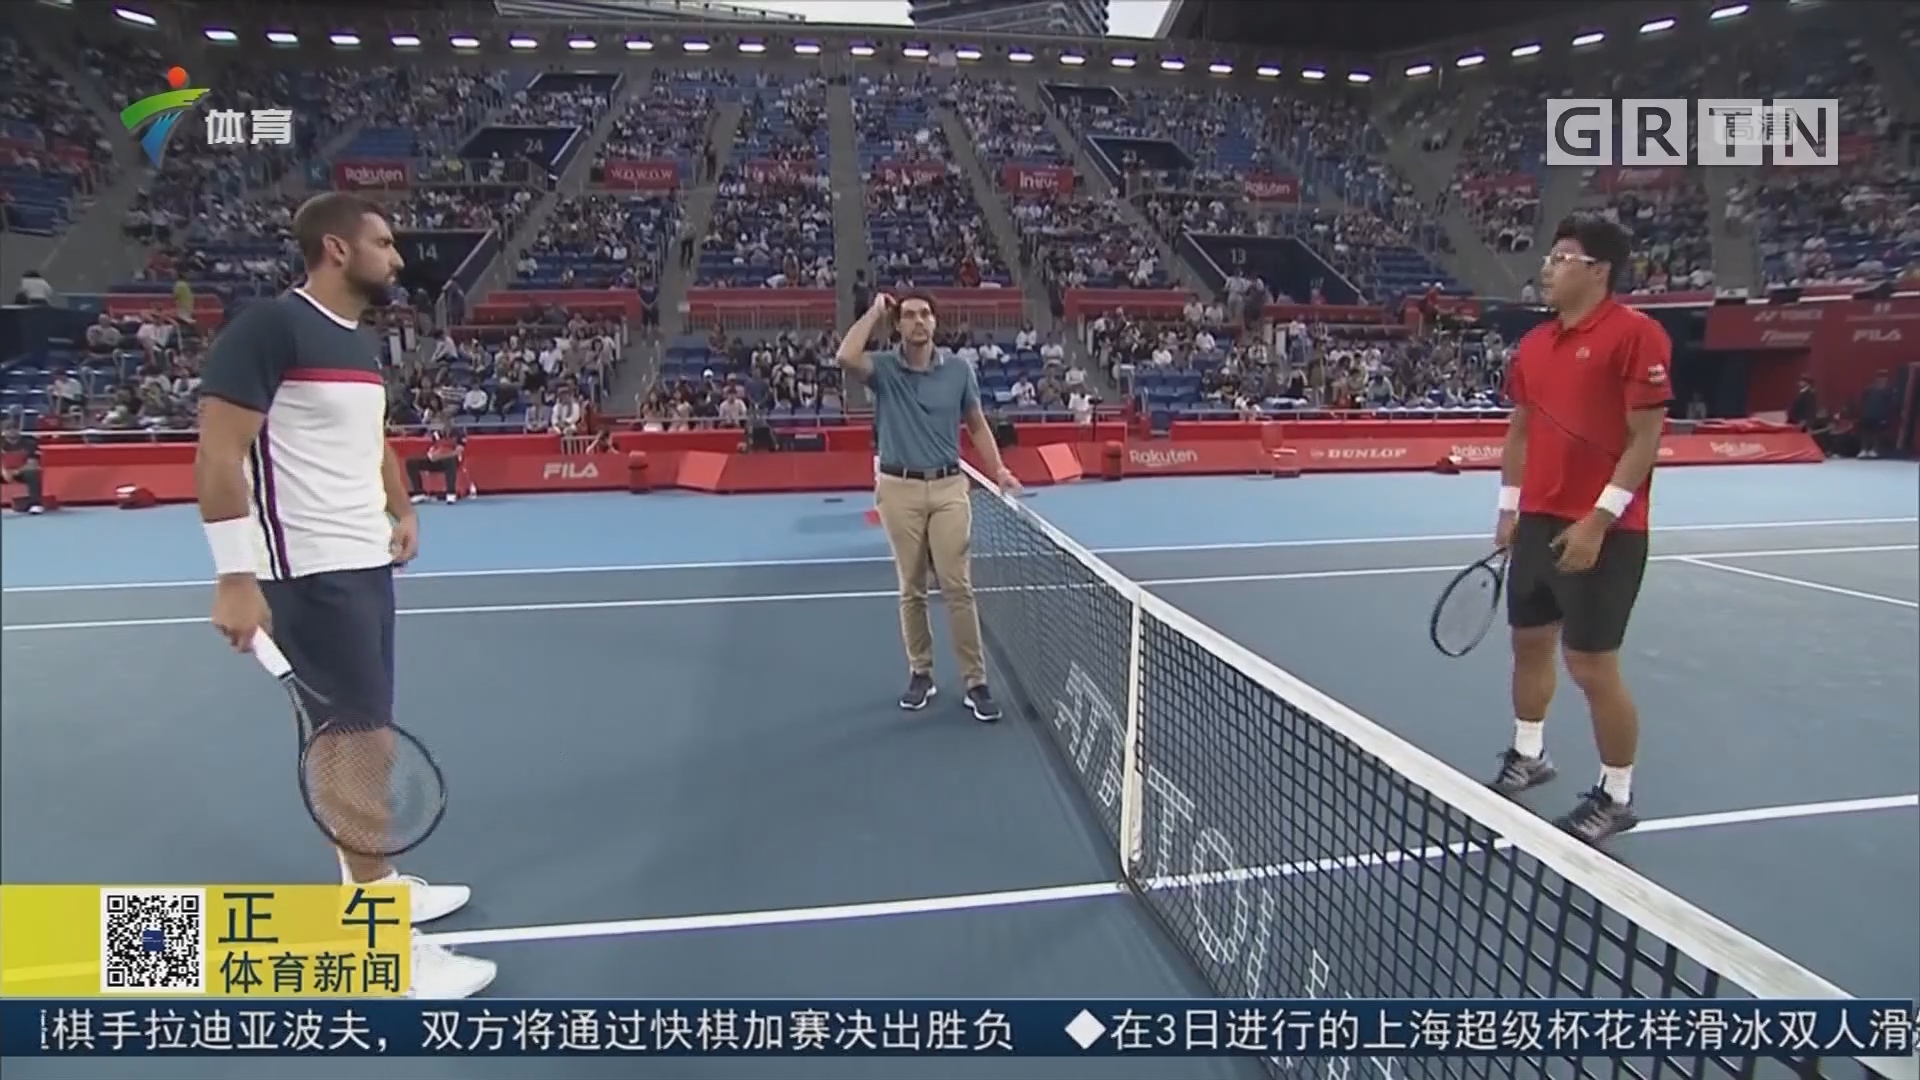 ATP東京賽 戈芬攜手鄭泫晉級男單八強